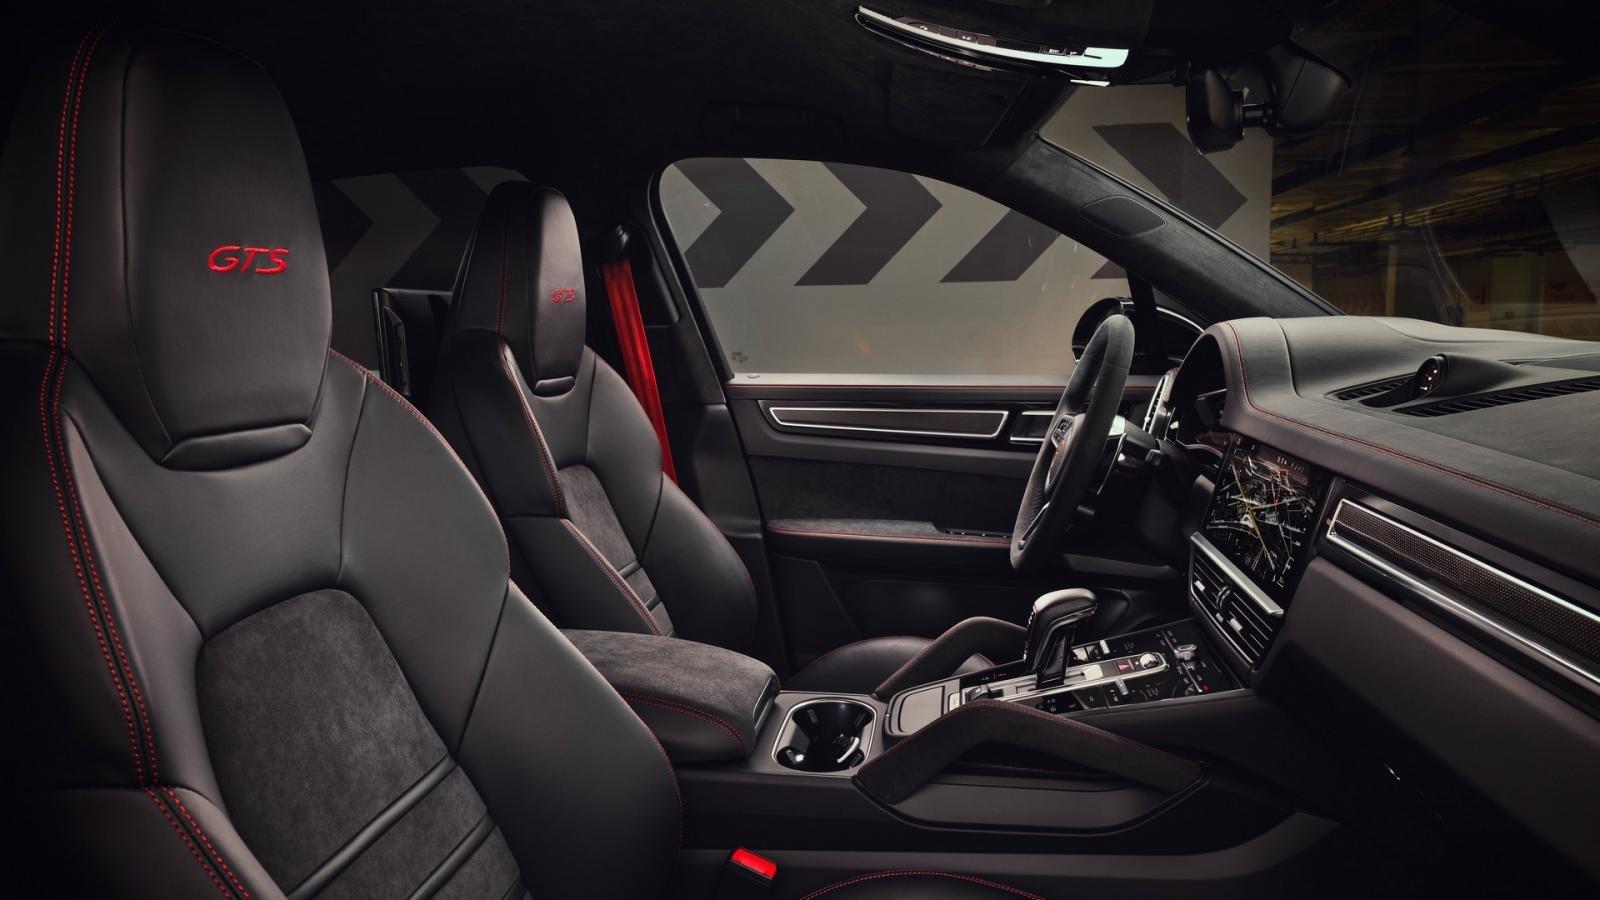 Porsche Cayenne GTS trang trí đẹp mắt.